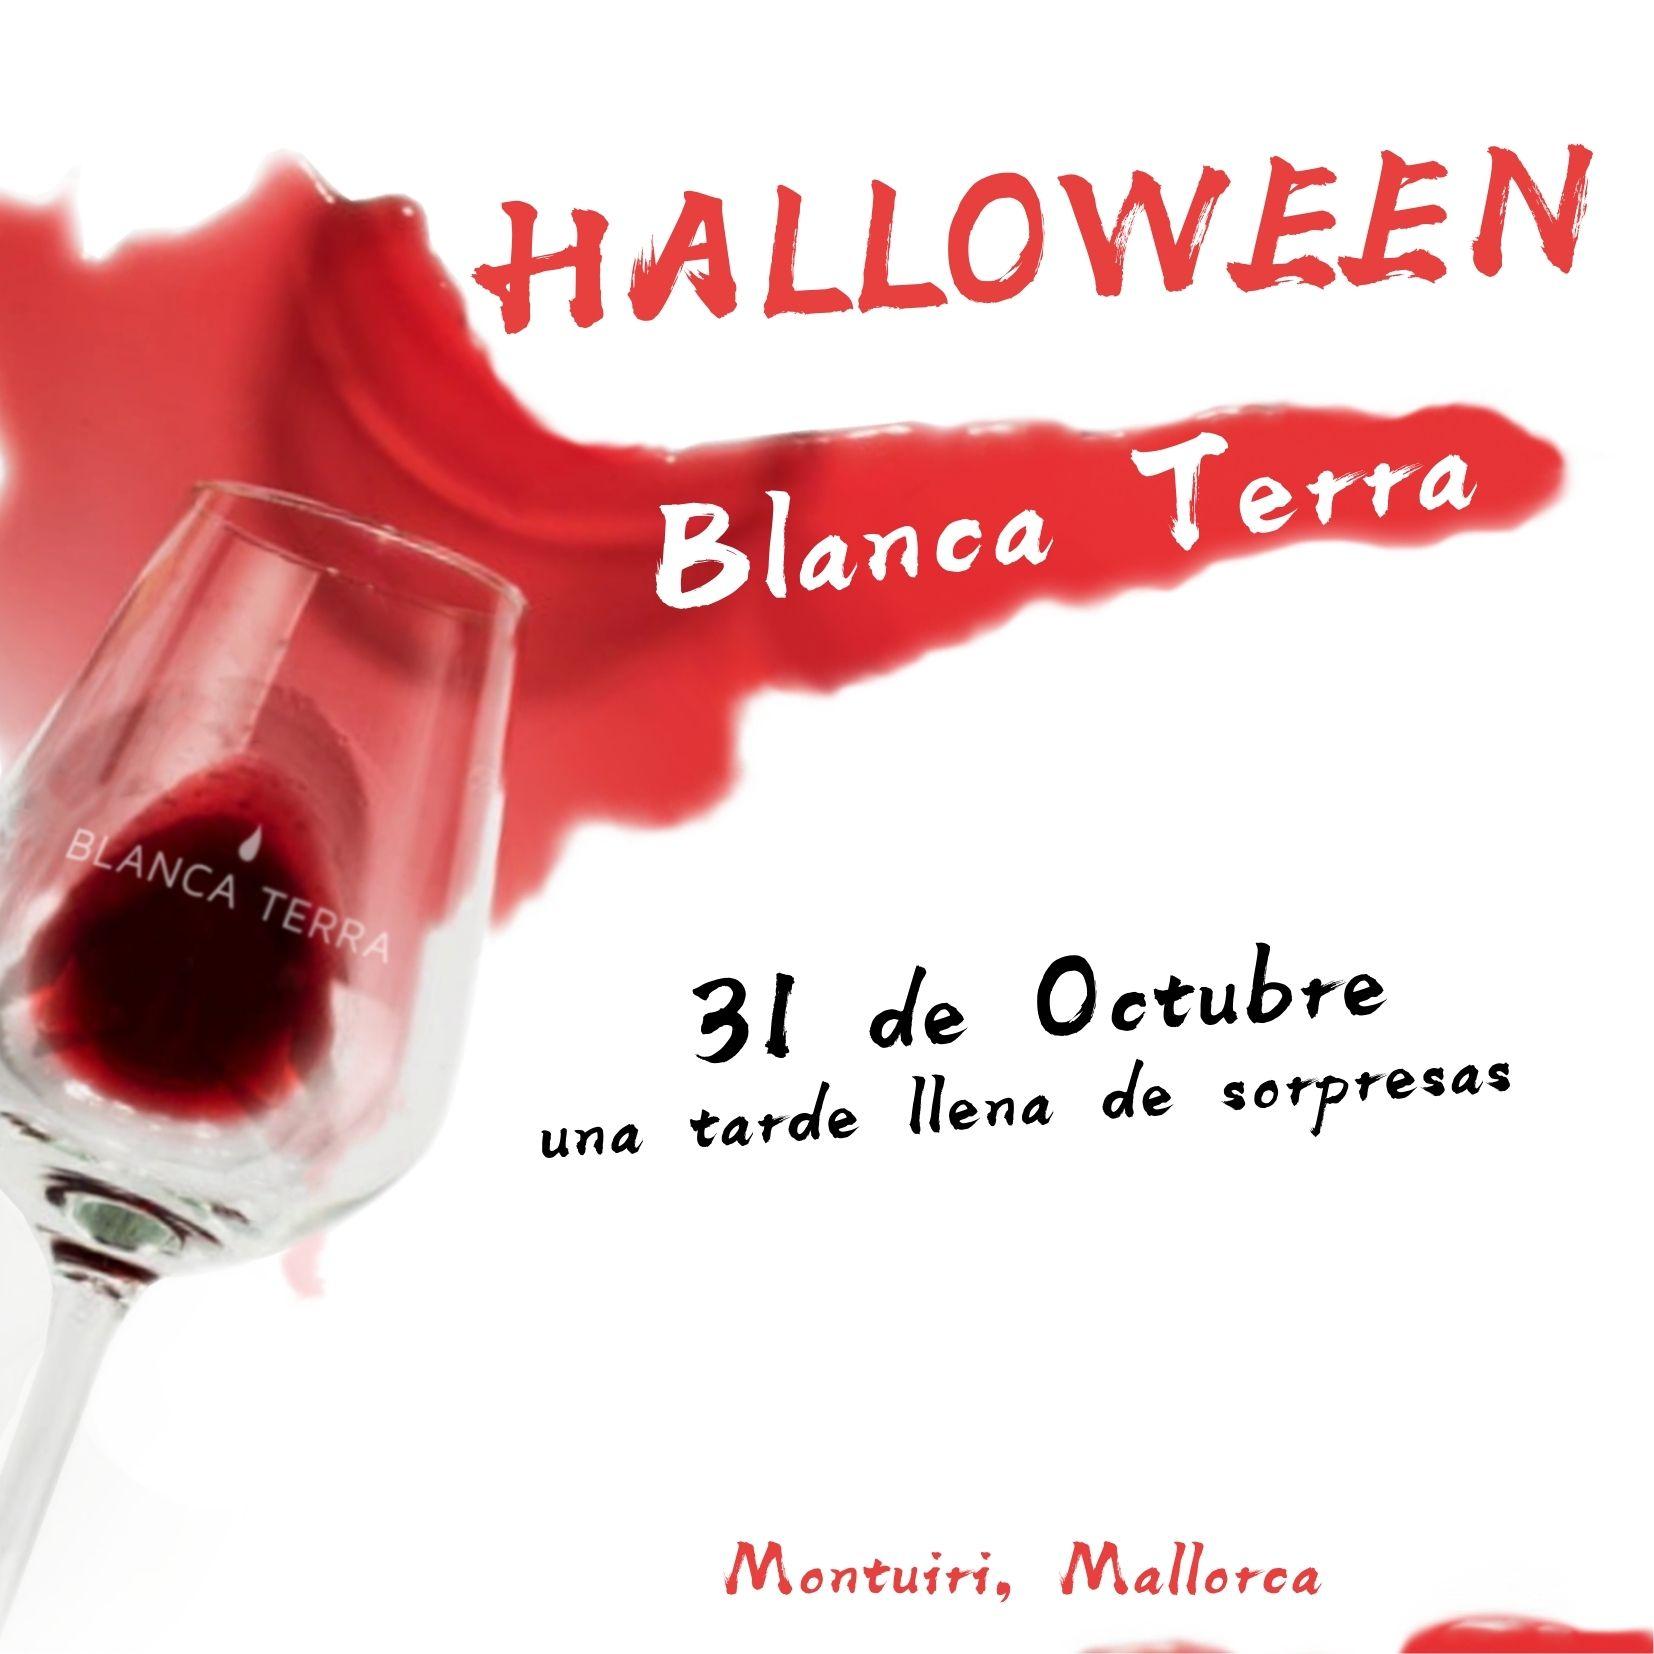 Blanca Terra Invitacion Fiesta de Halloween 2021